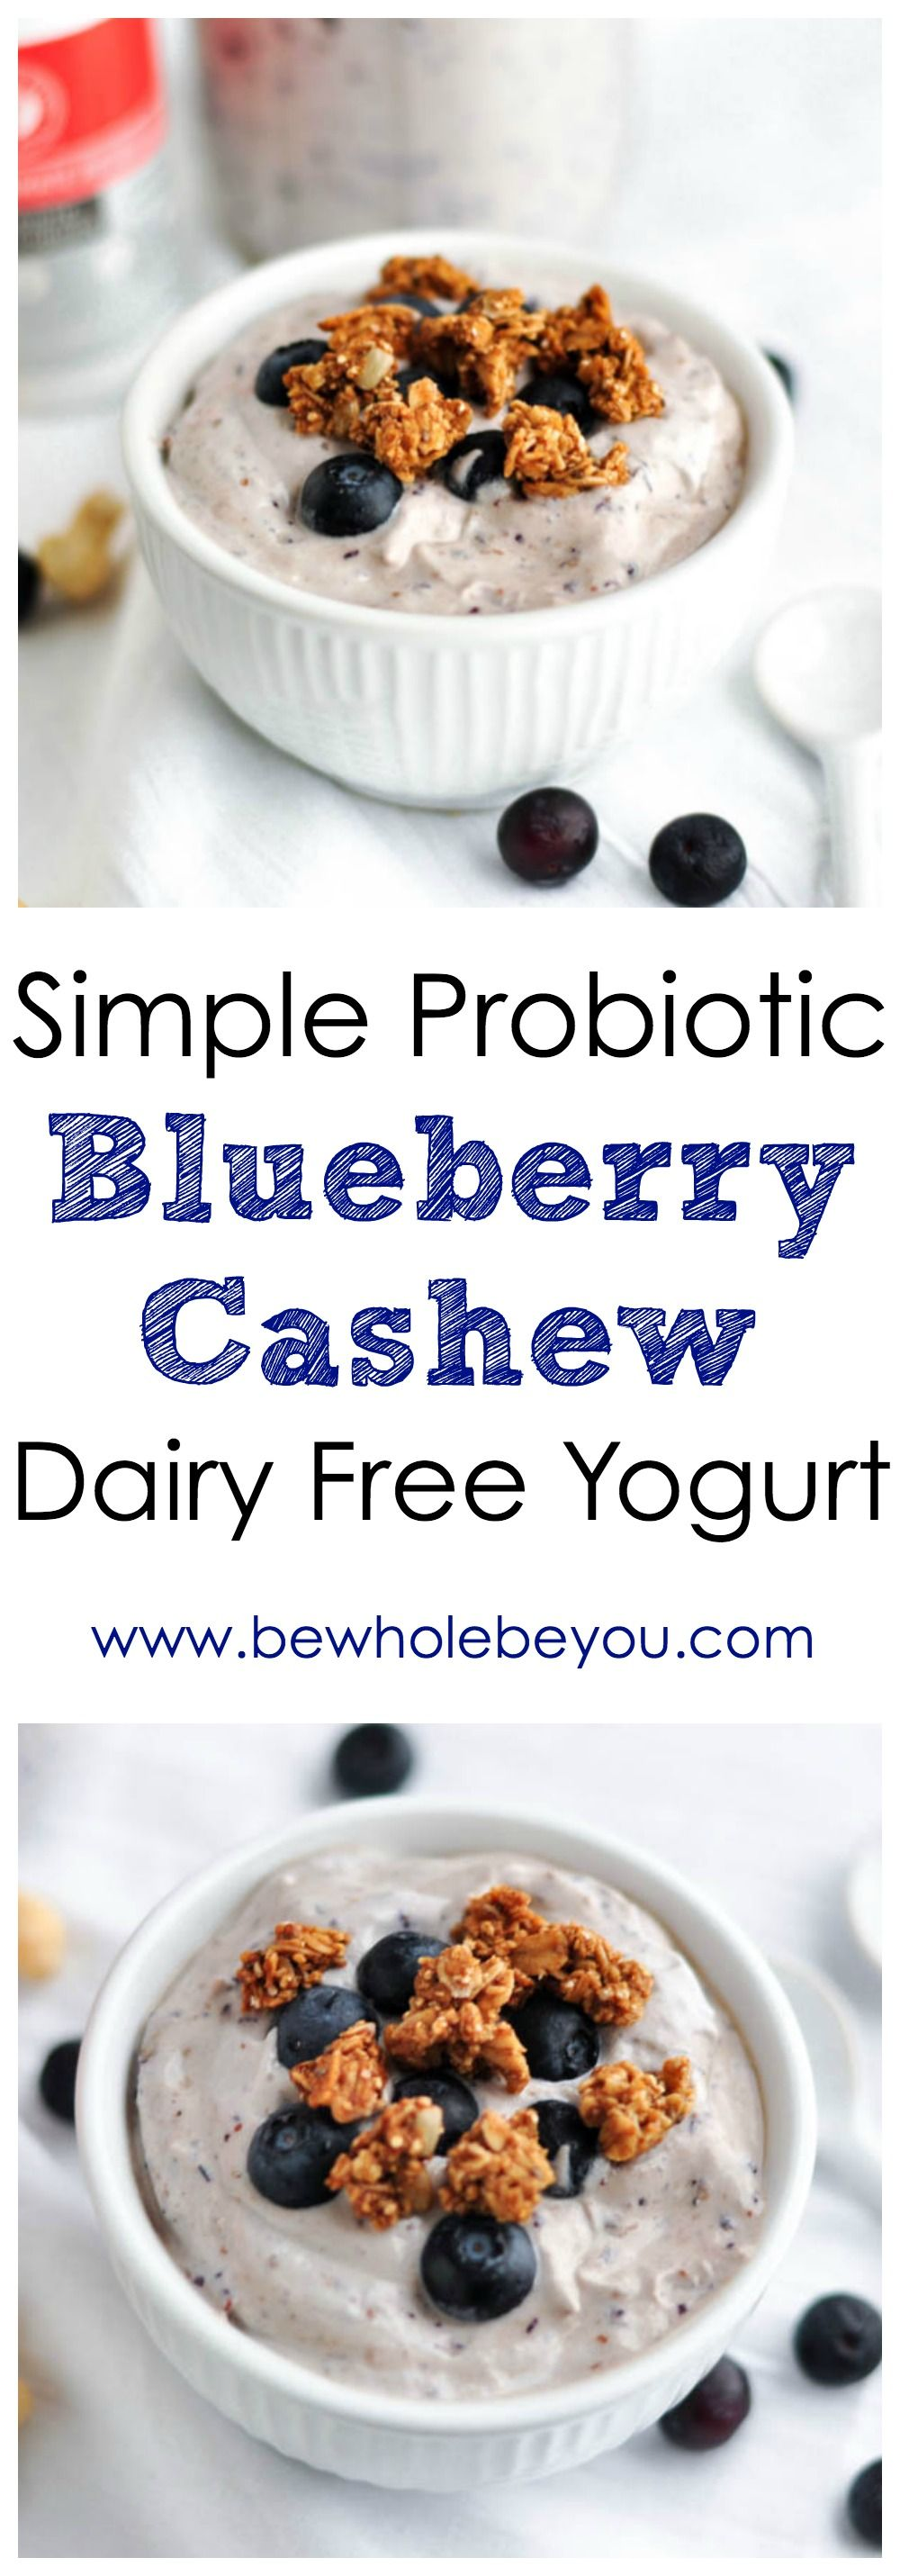 Simple Blueberry Cashew Dairy Free Probiotic Yogurt